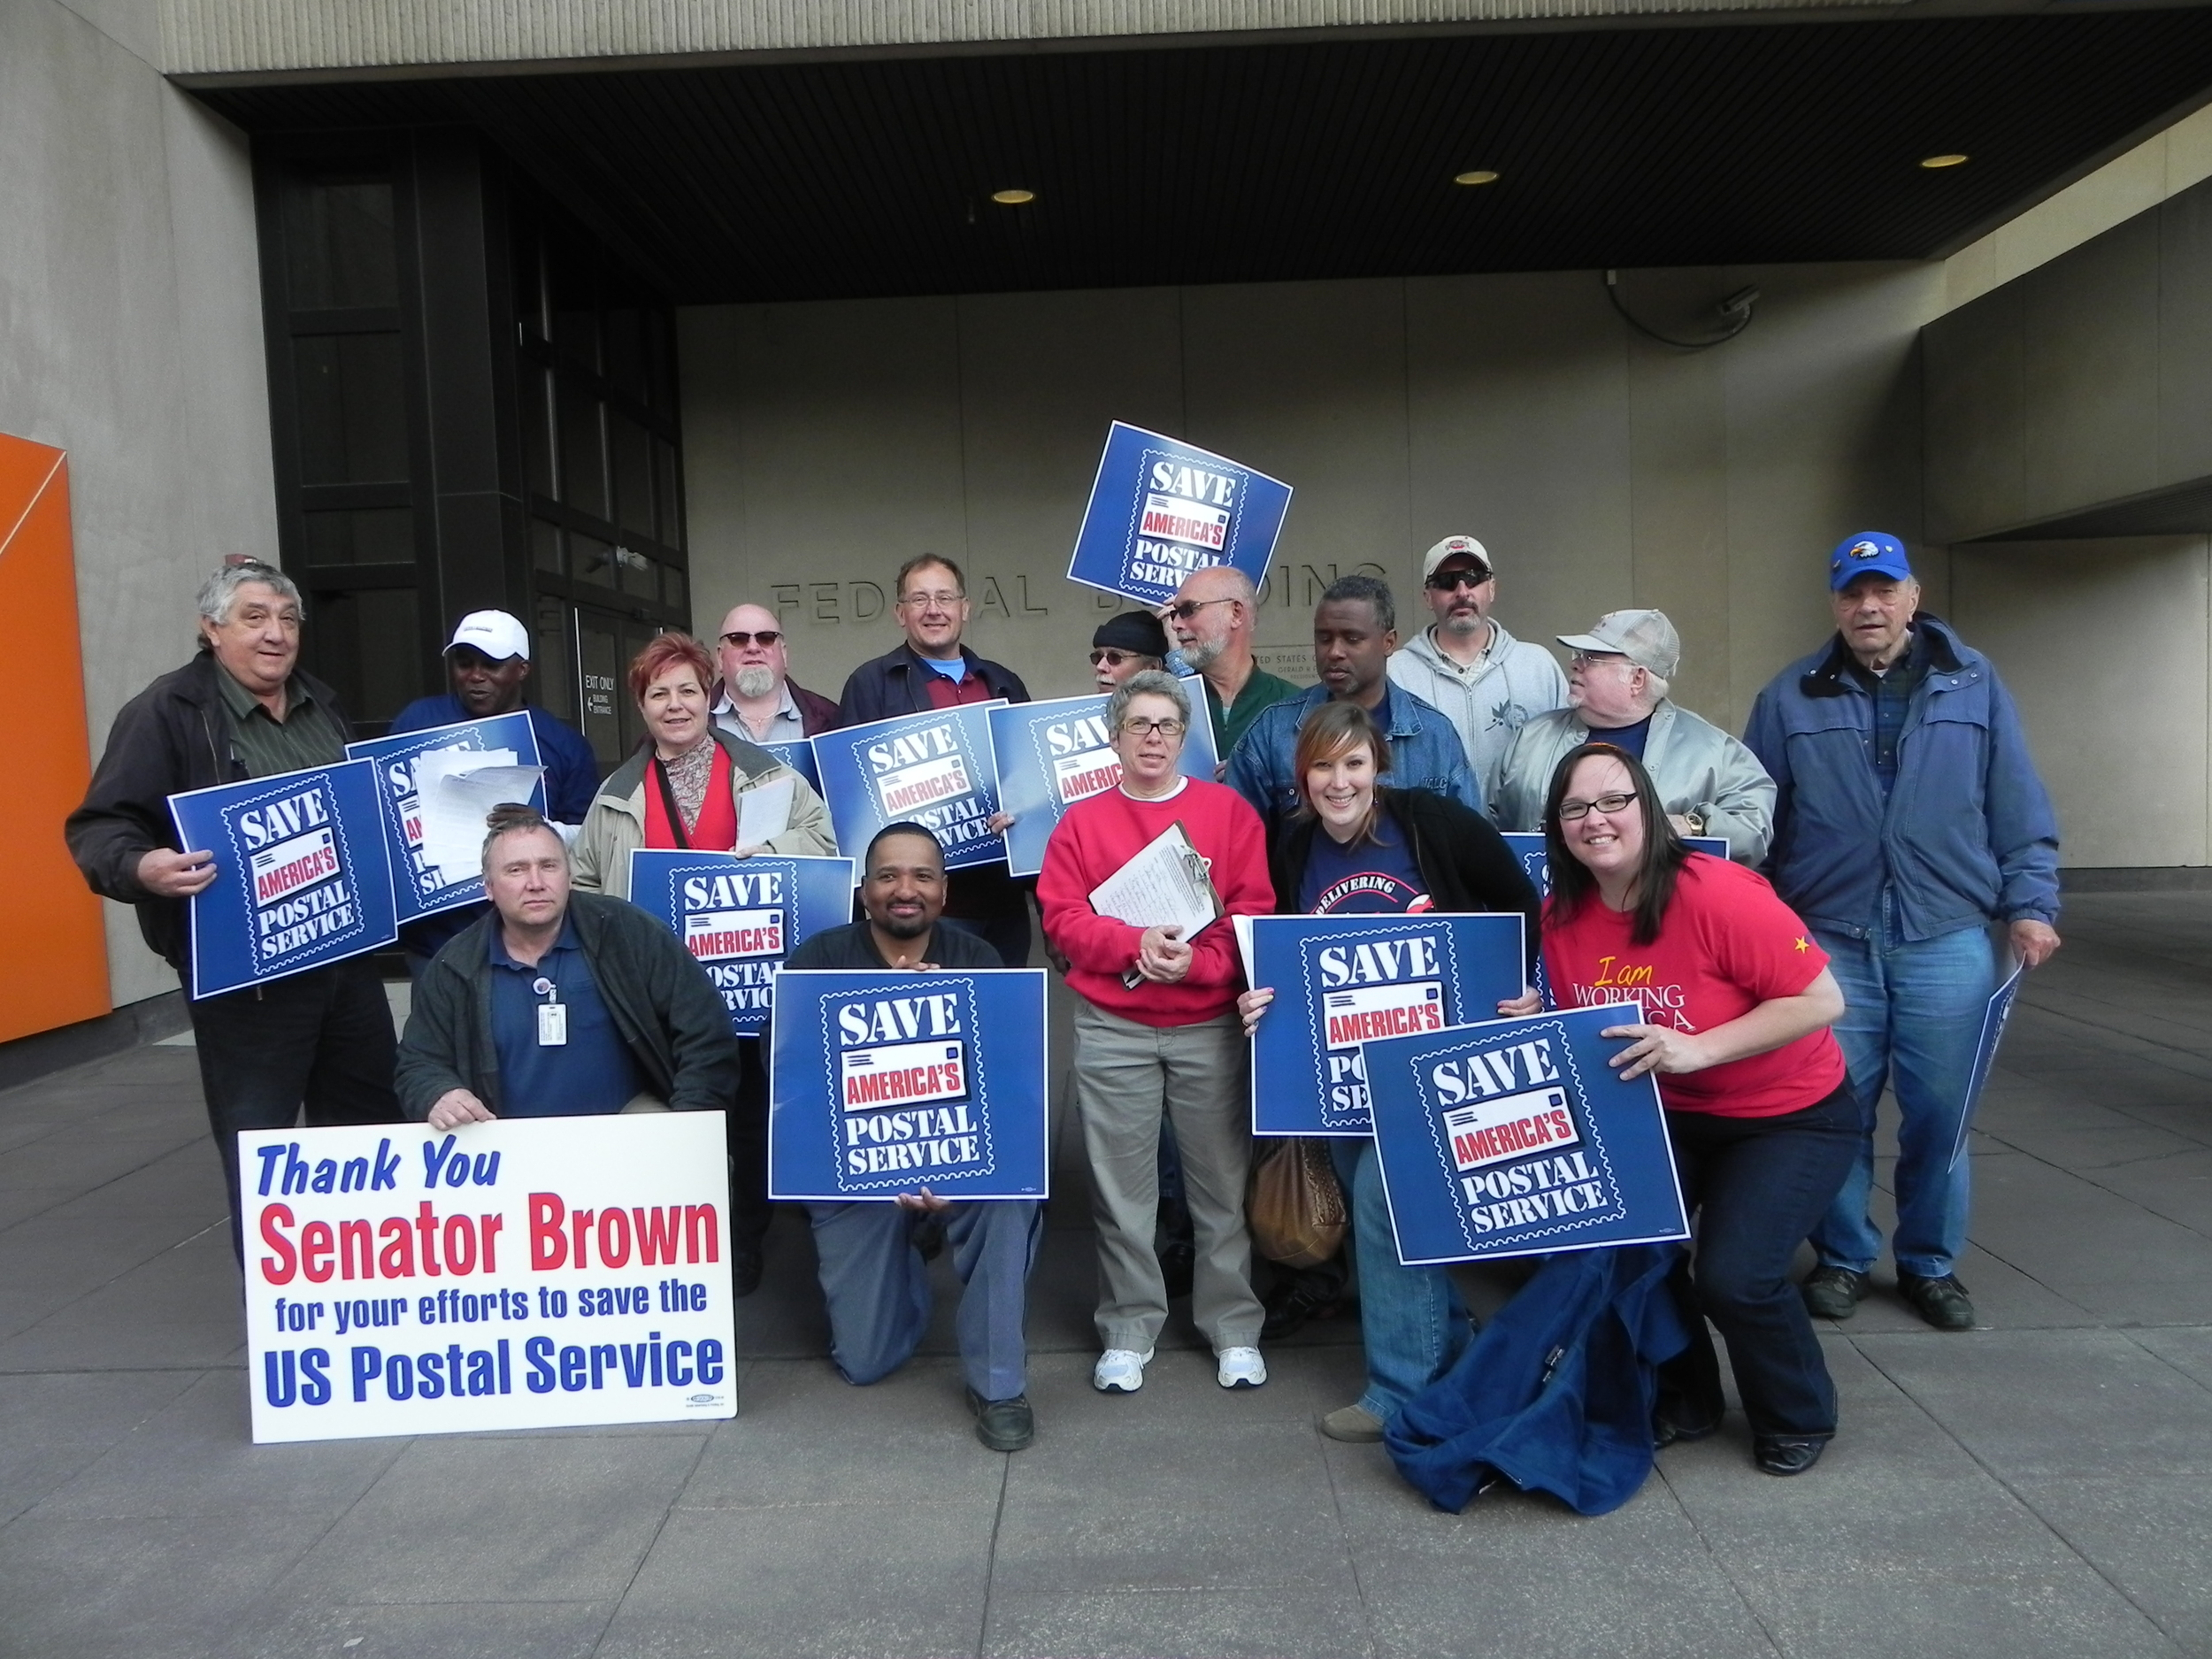 save-the-postal-service-rally---04-12-12_6927851494_o.jpg